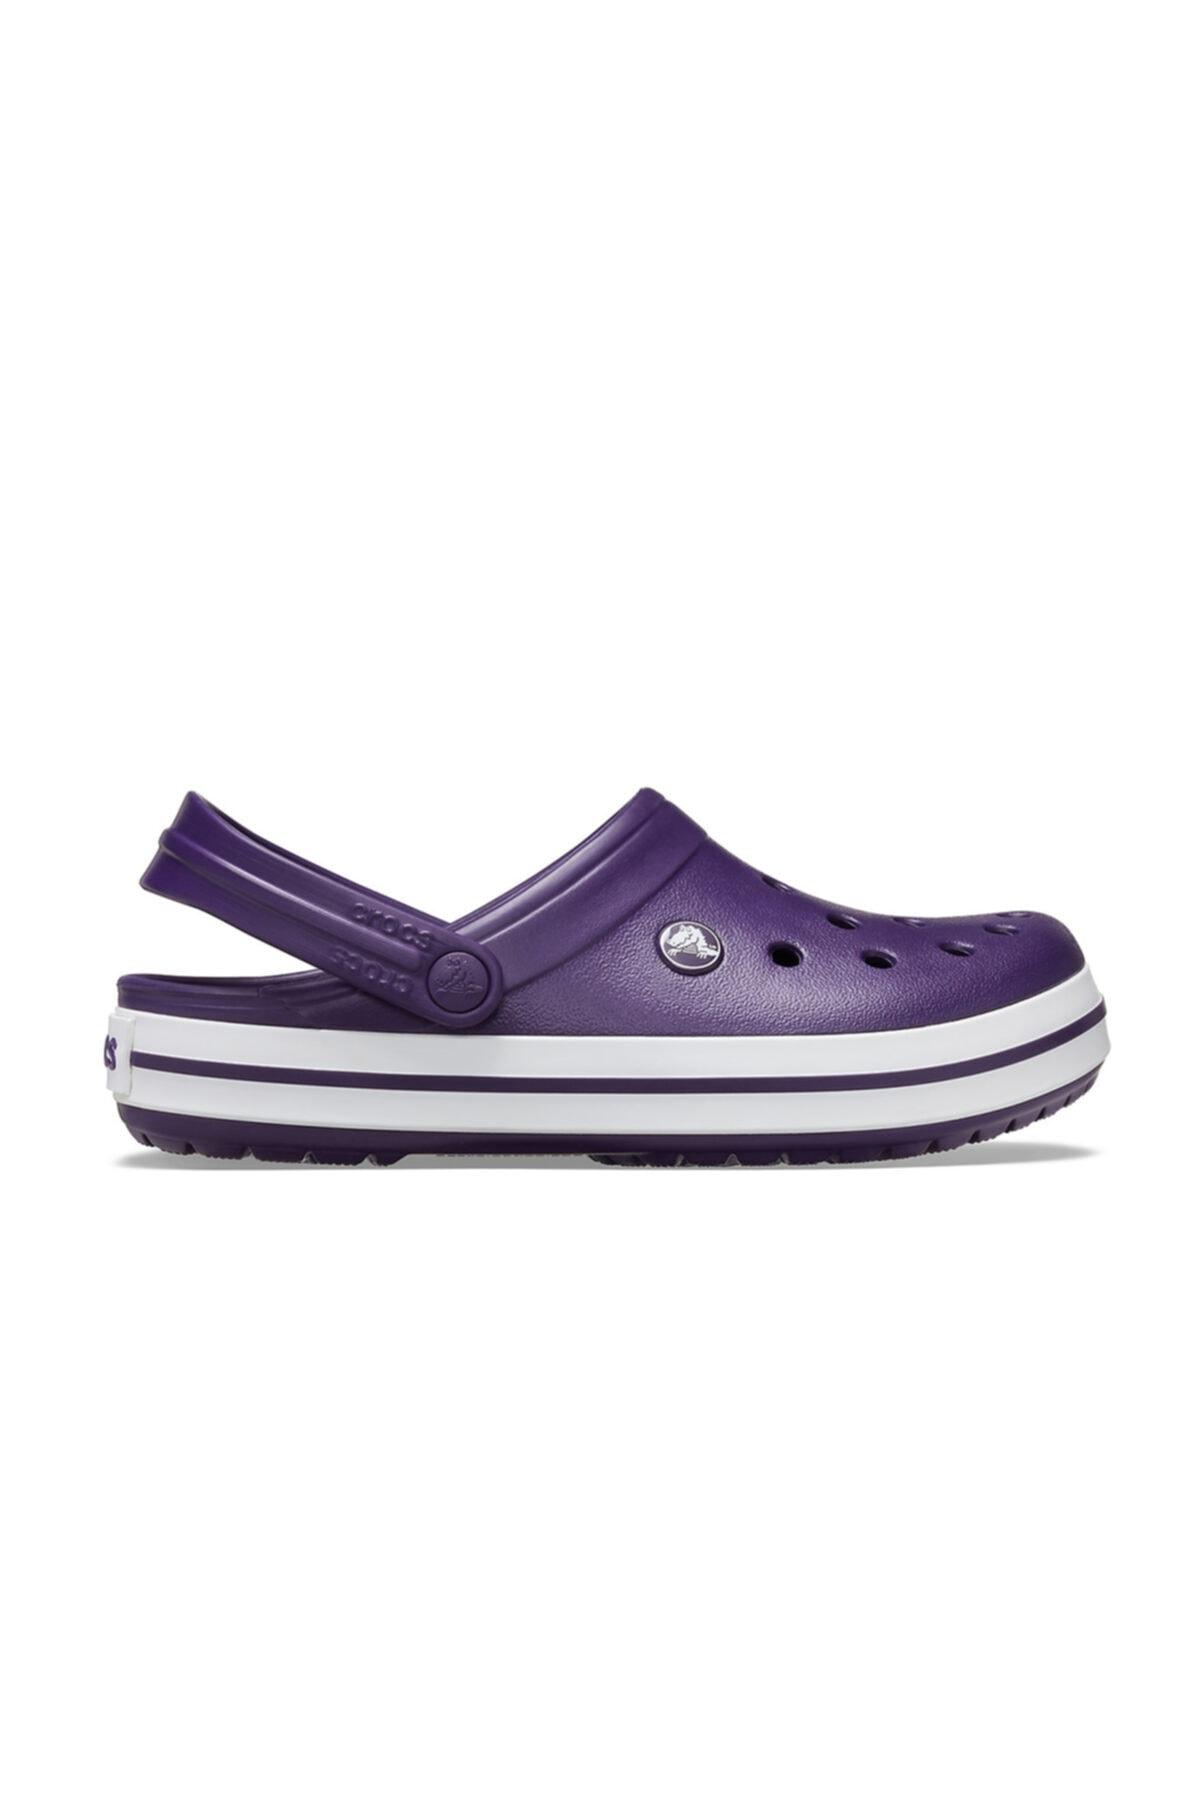 Crocs Unısex Mor Crocband Sandalet Terlik 11016-55y 1